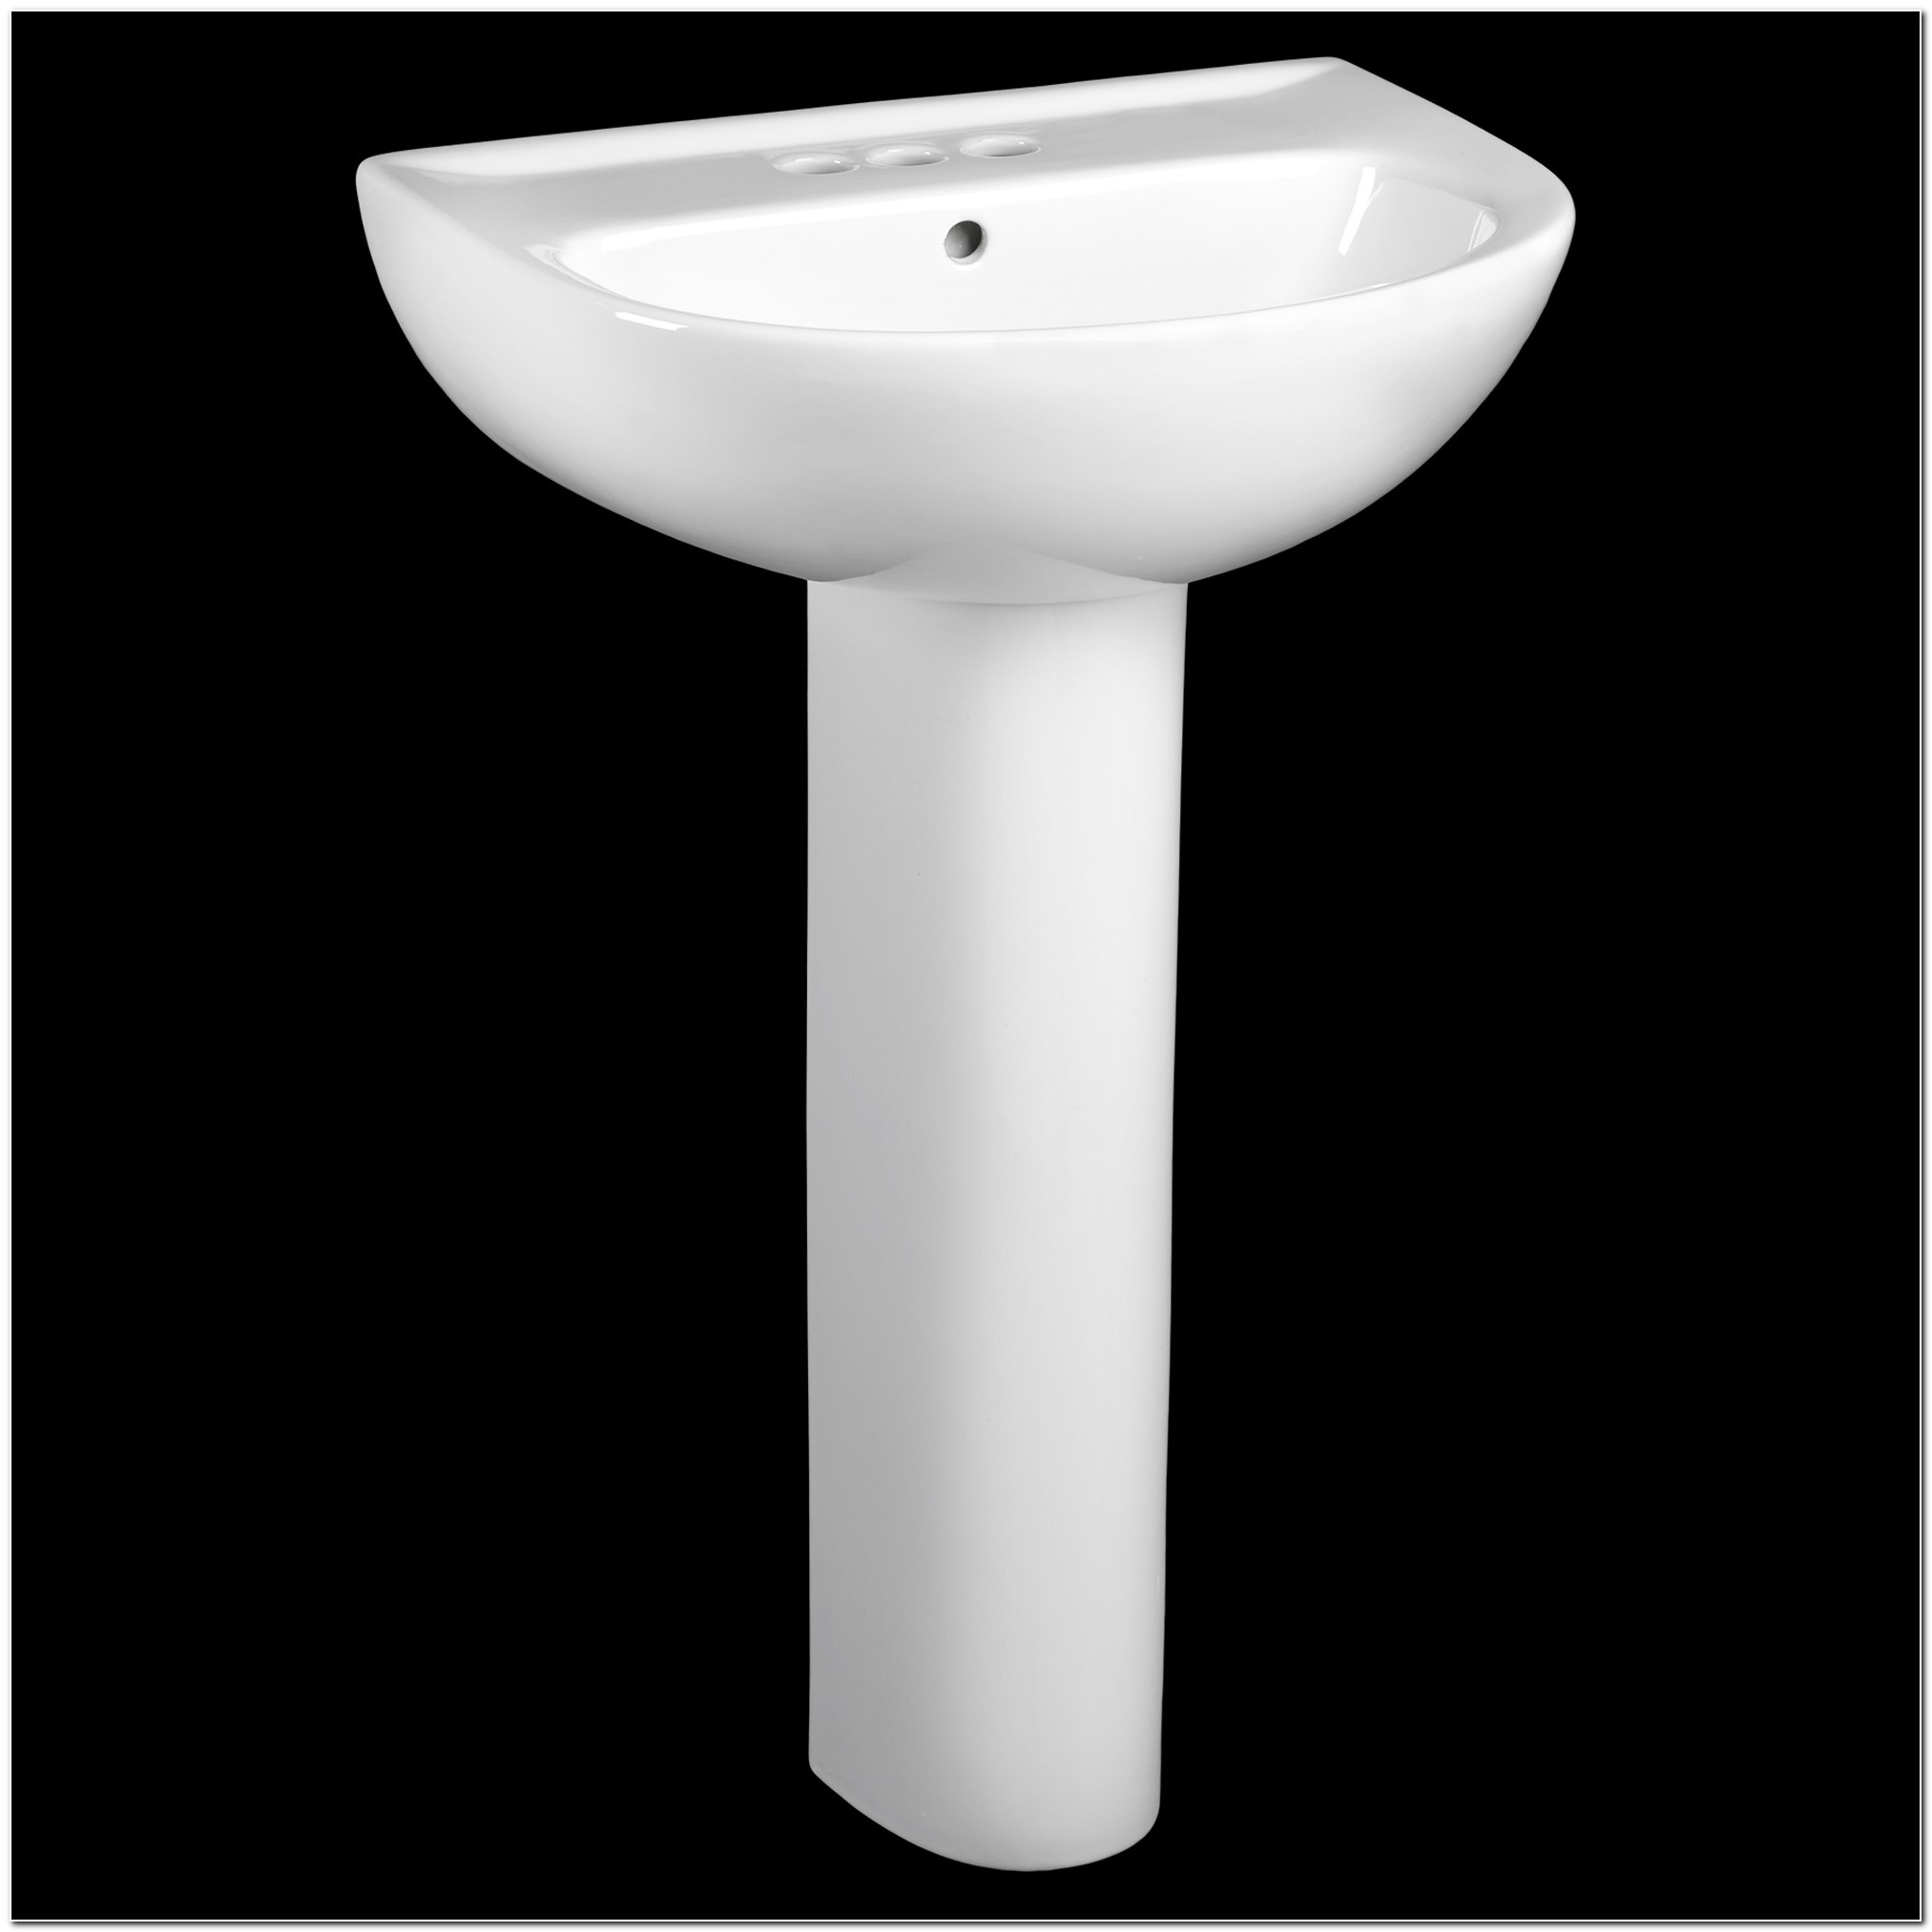 22 Inch Square Pedestal Sink